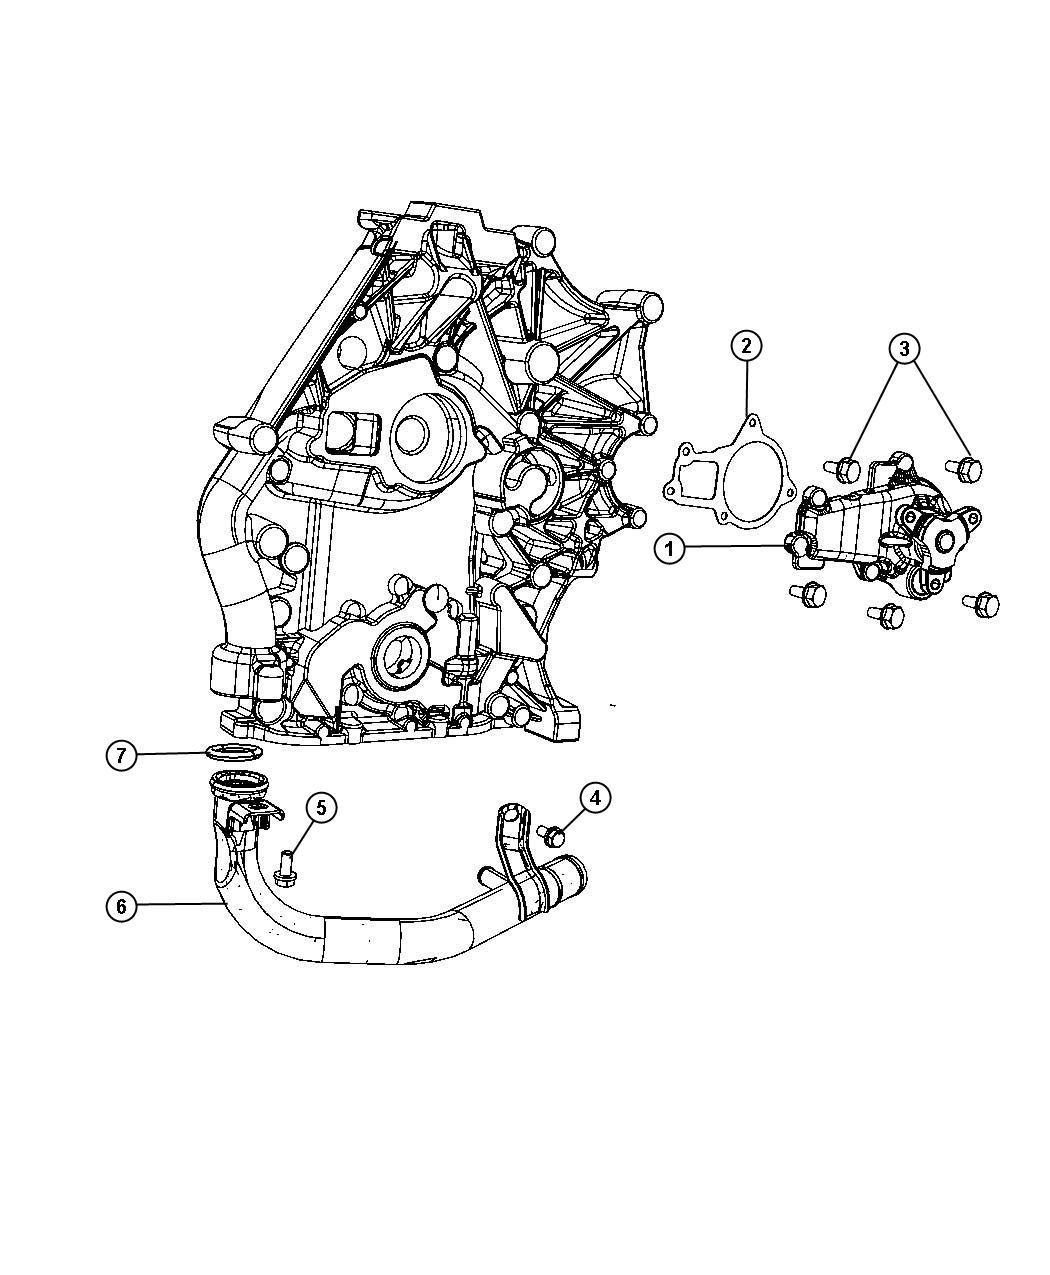 2008 Dodge Grand Caravan Pump  Water  Engine  Ohv  Timing